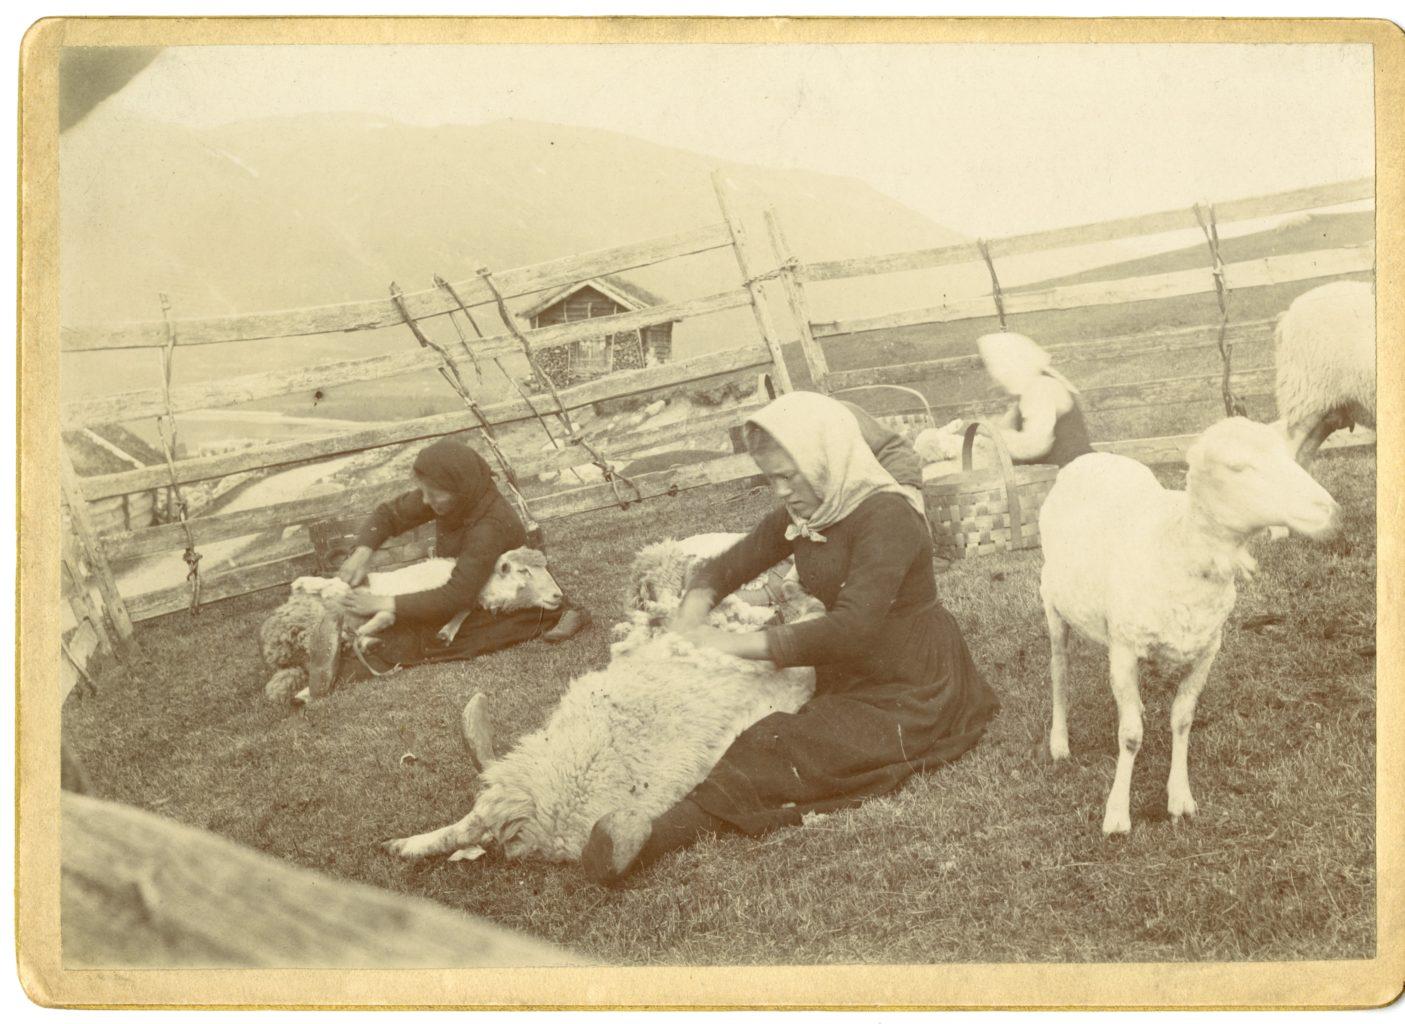 Three women sheer sheep on the farm.